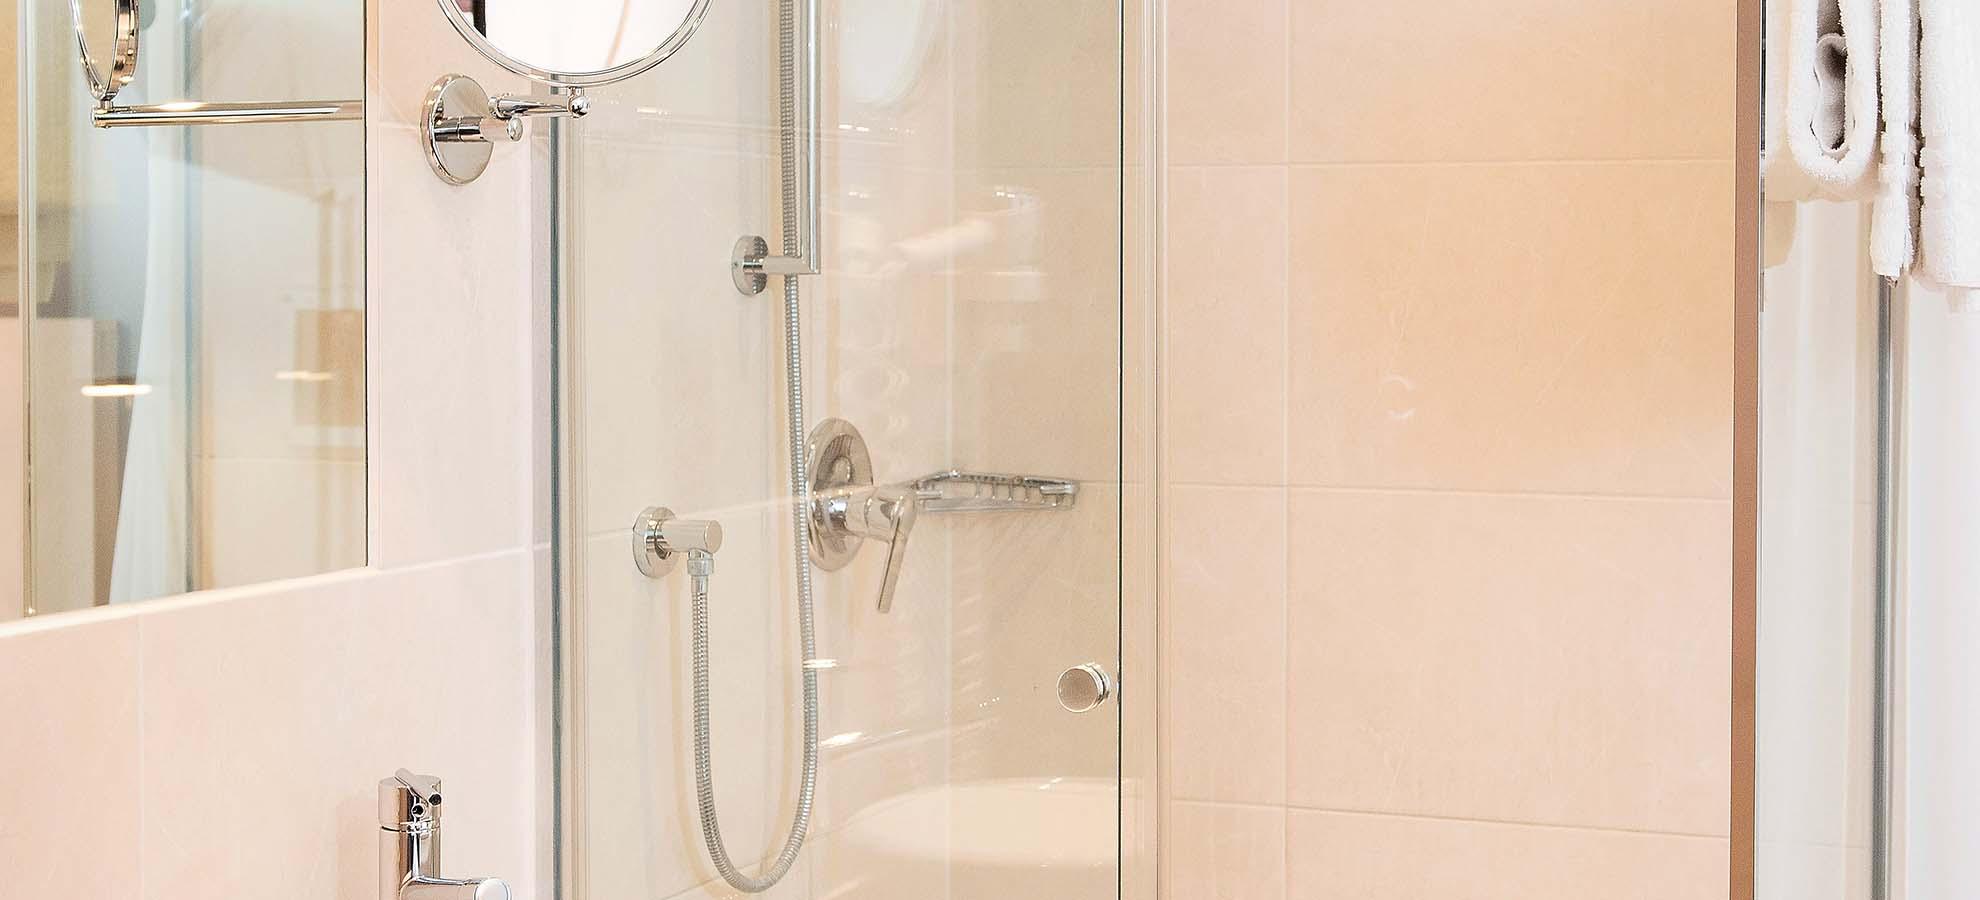 Hotel Lyskirchen Standard Zimmer Bad / Standard Room bath